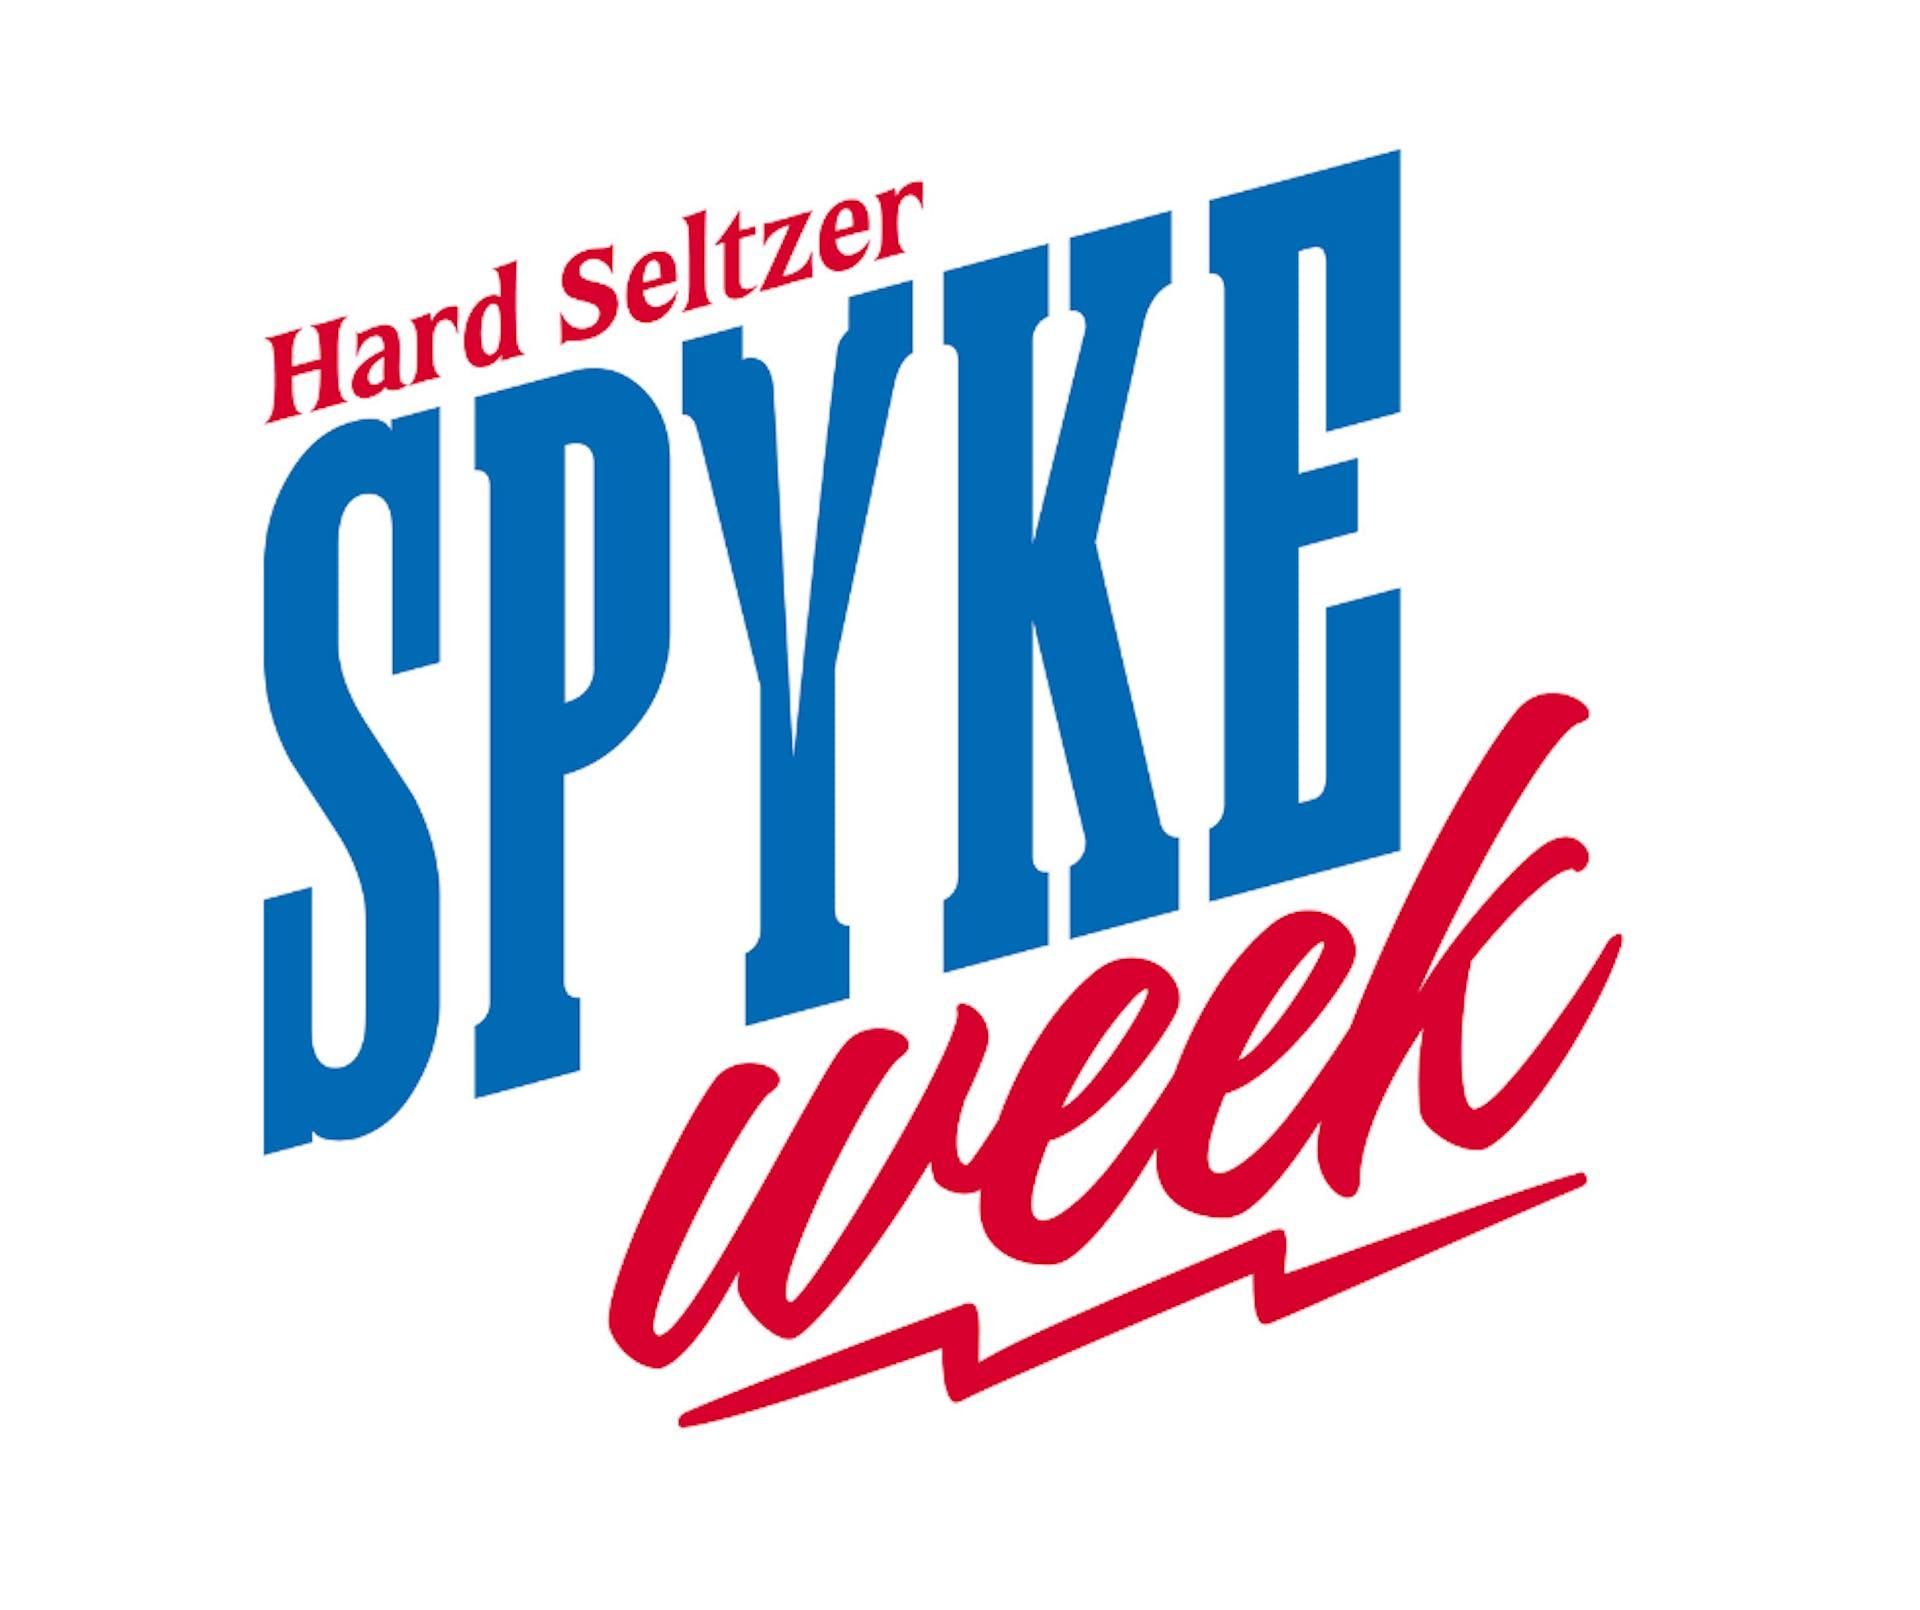 spyke week fb post